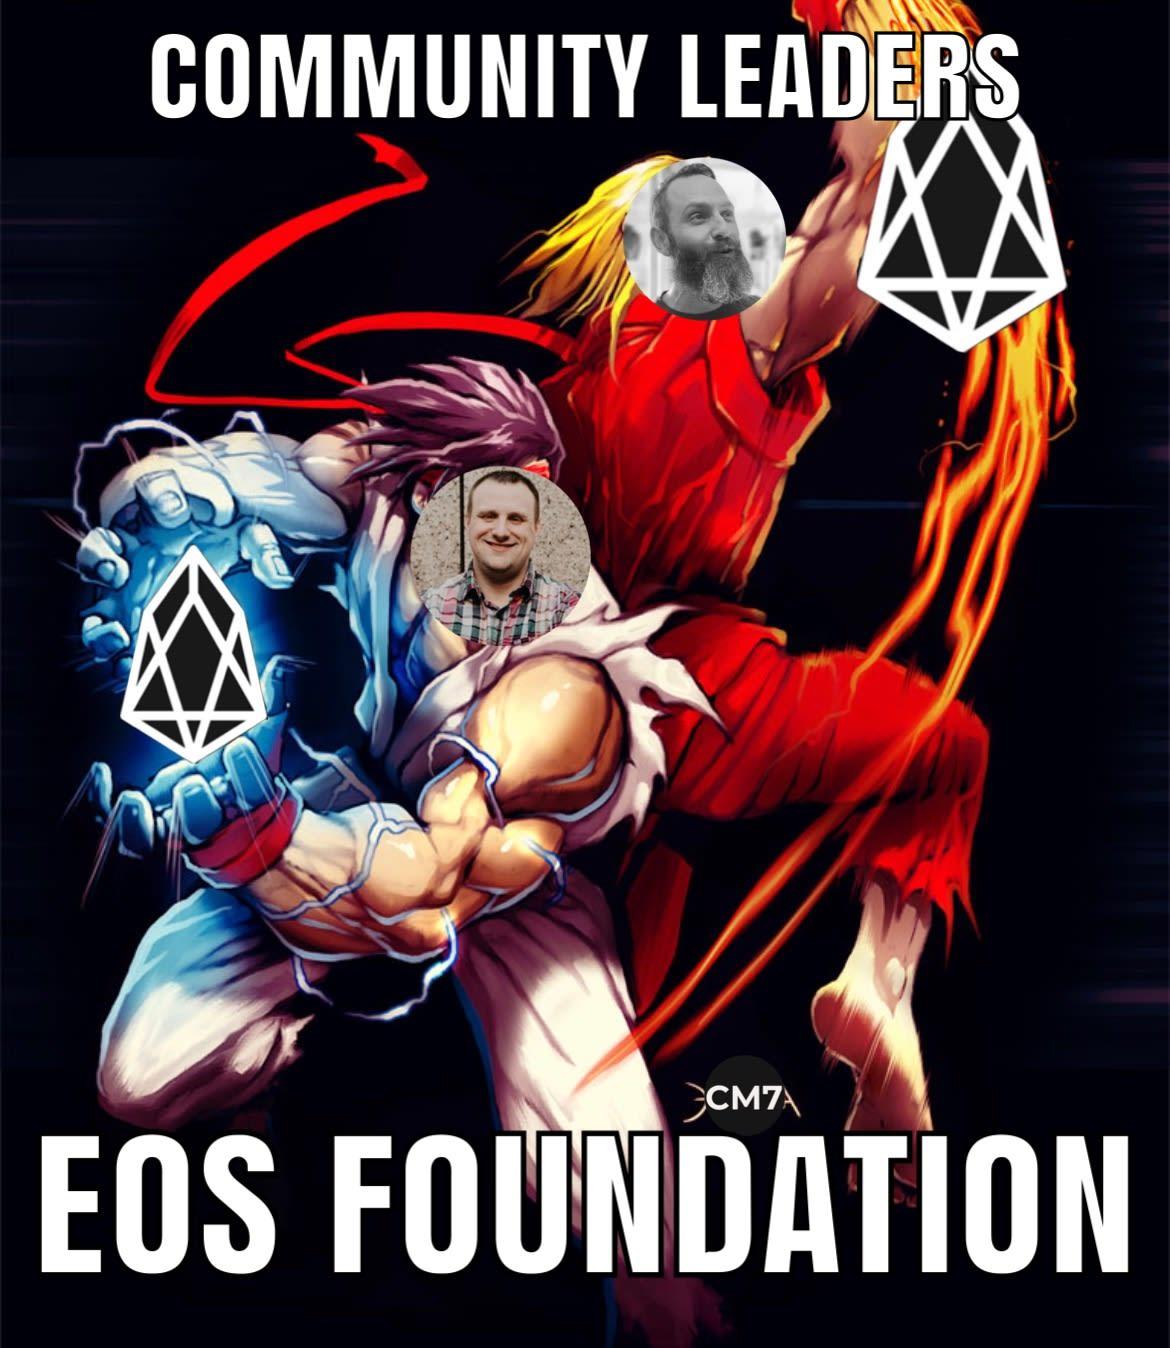 Community Leaders, EOS Foundation